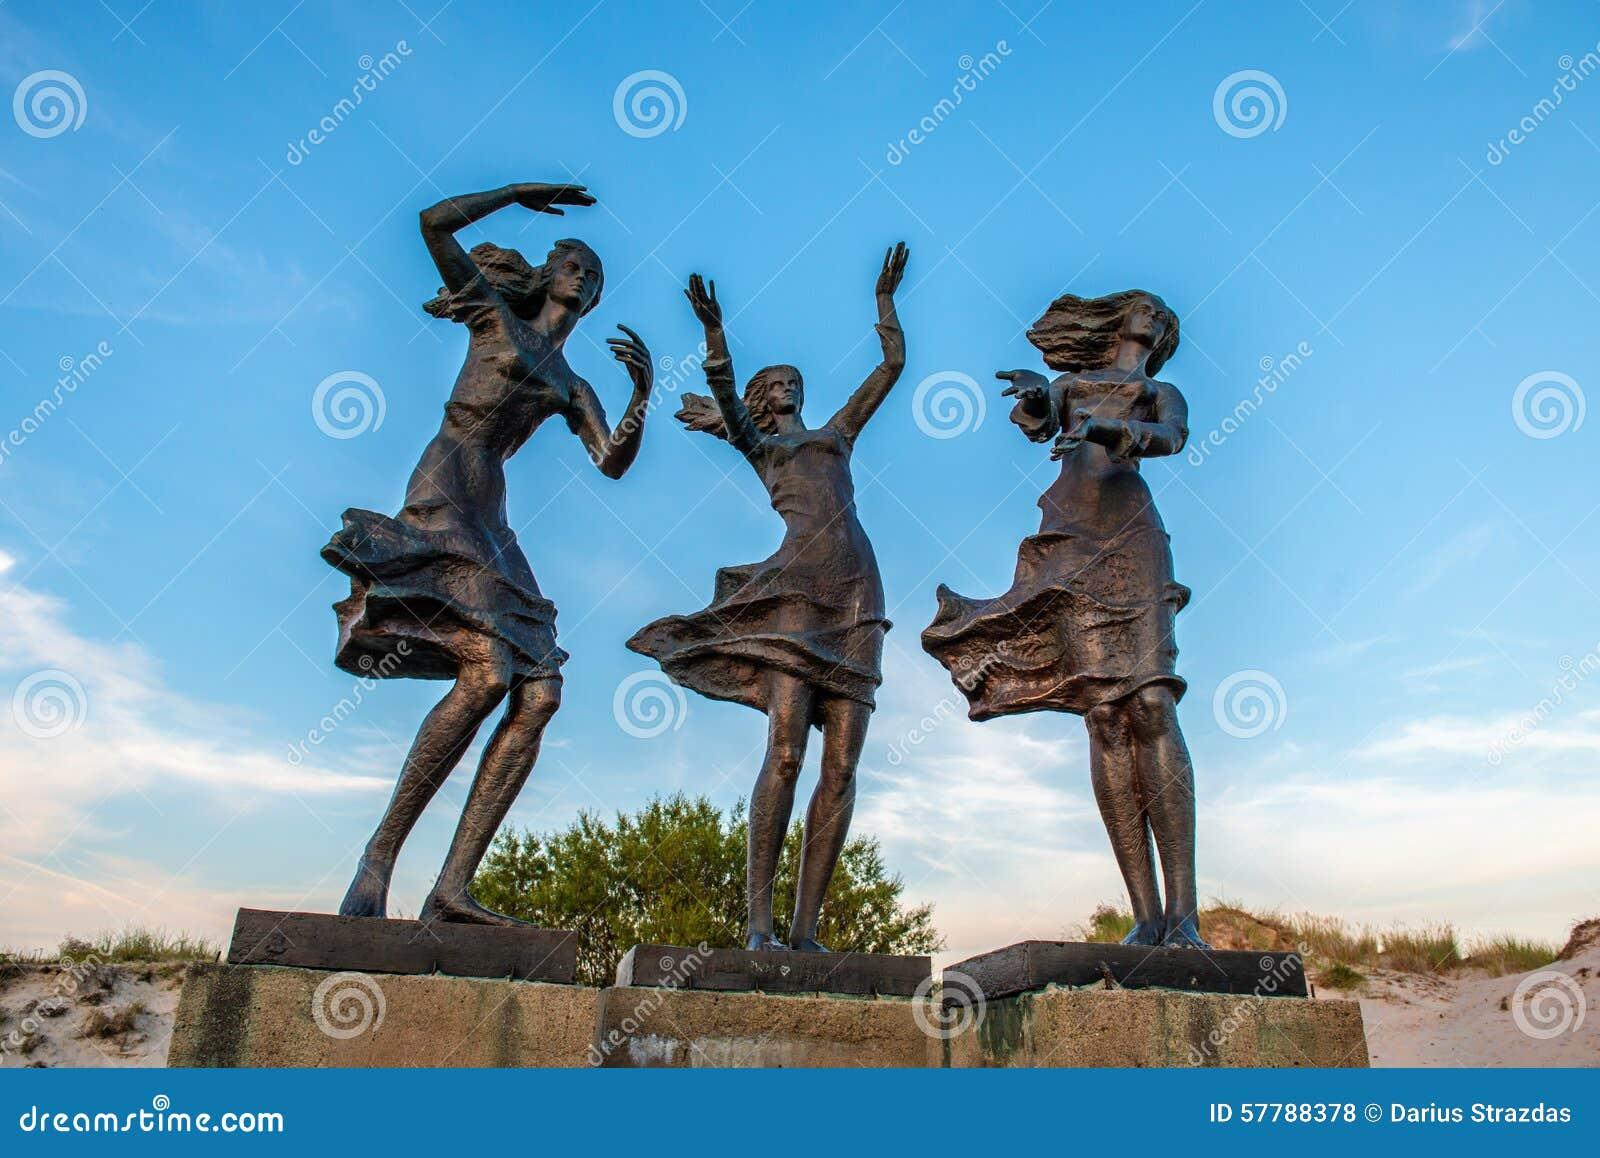 Rzeźba w Sventoji